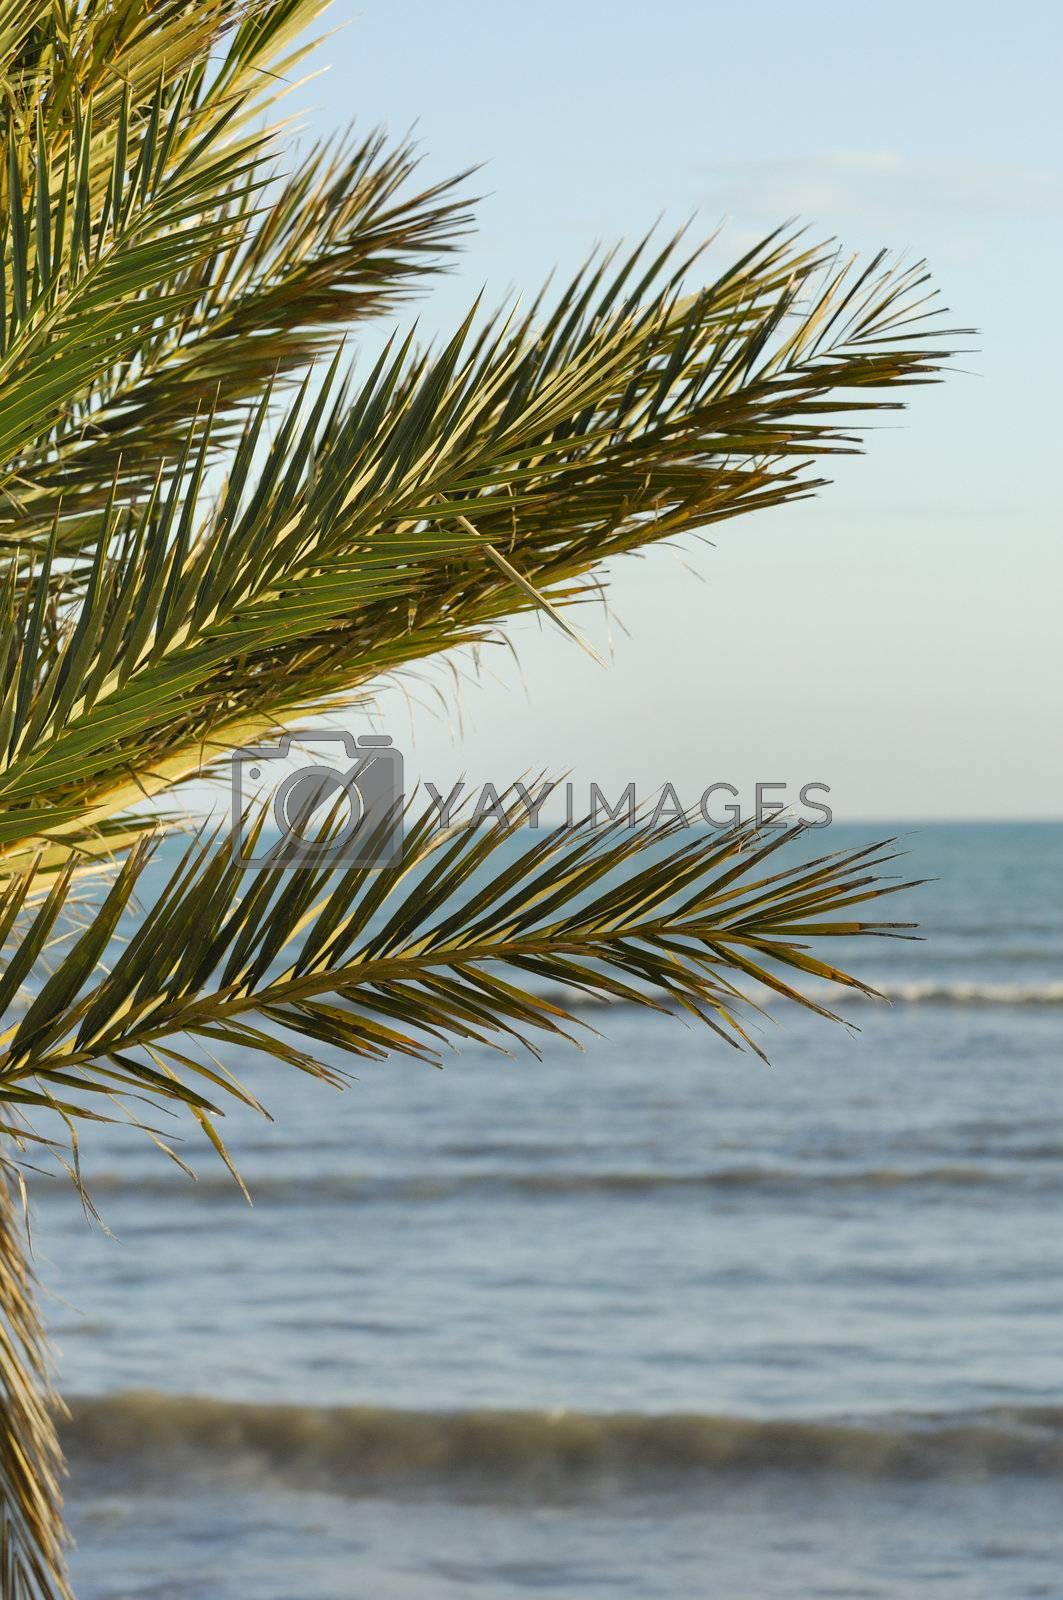 Tunisia by swimnews